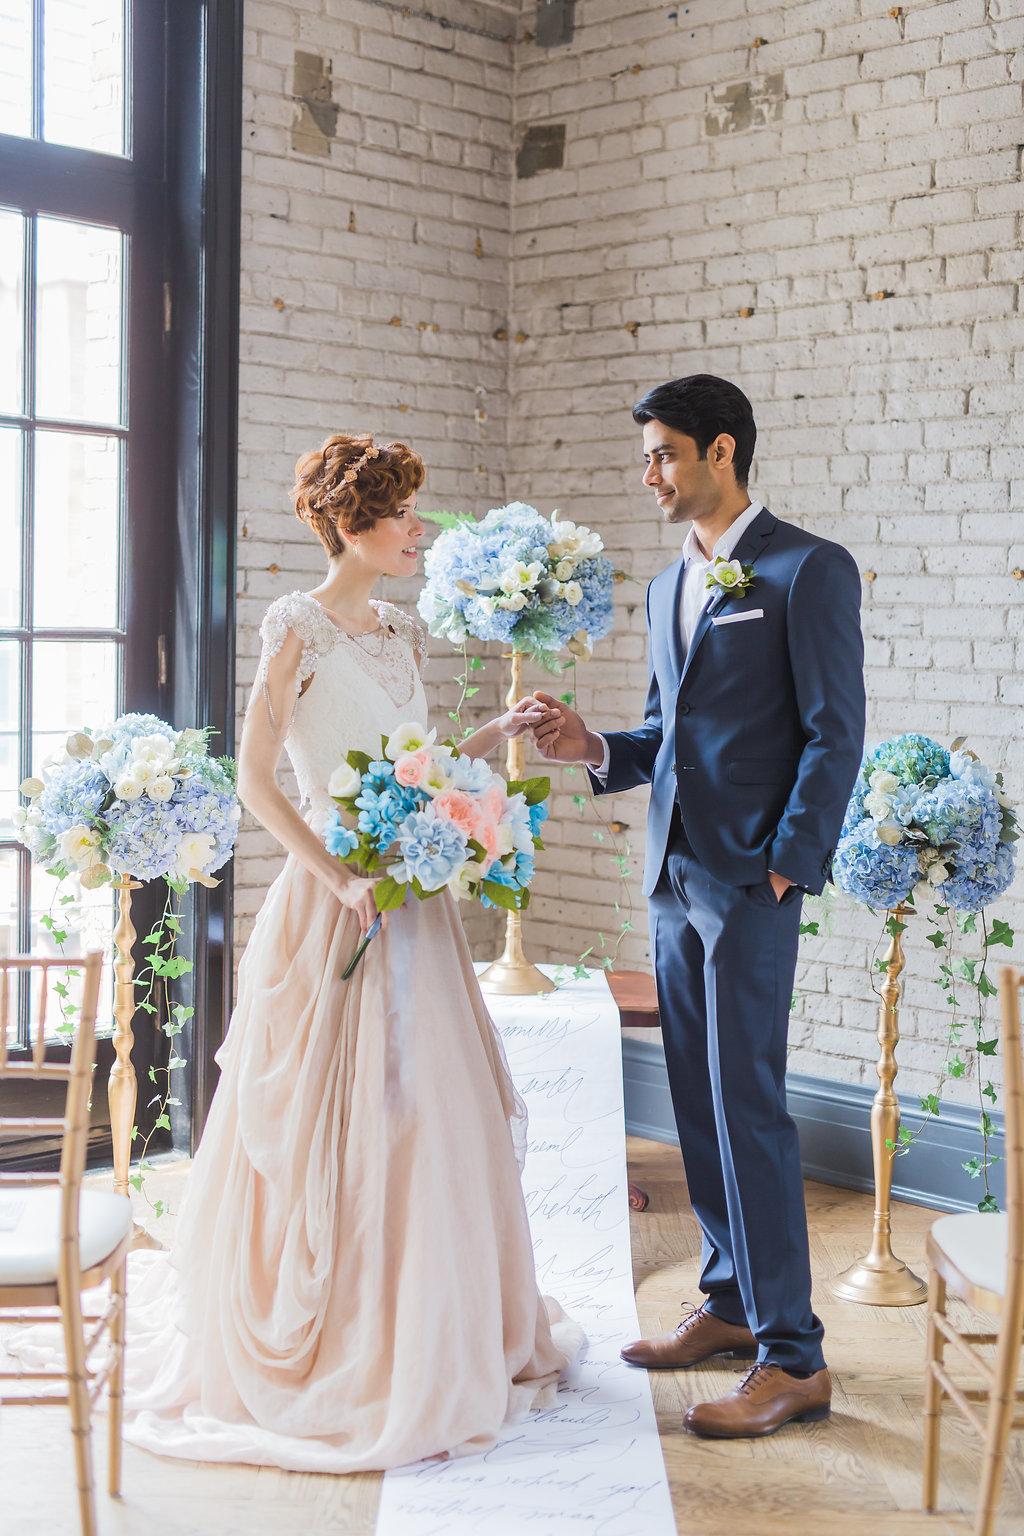 Phoebe Lo Events Toronto Wedding - Storys Building Urban Loft Paper Inspired Wedding 008.jpg